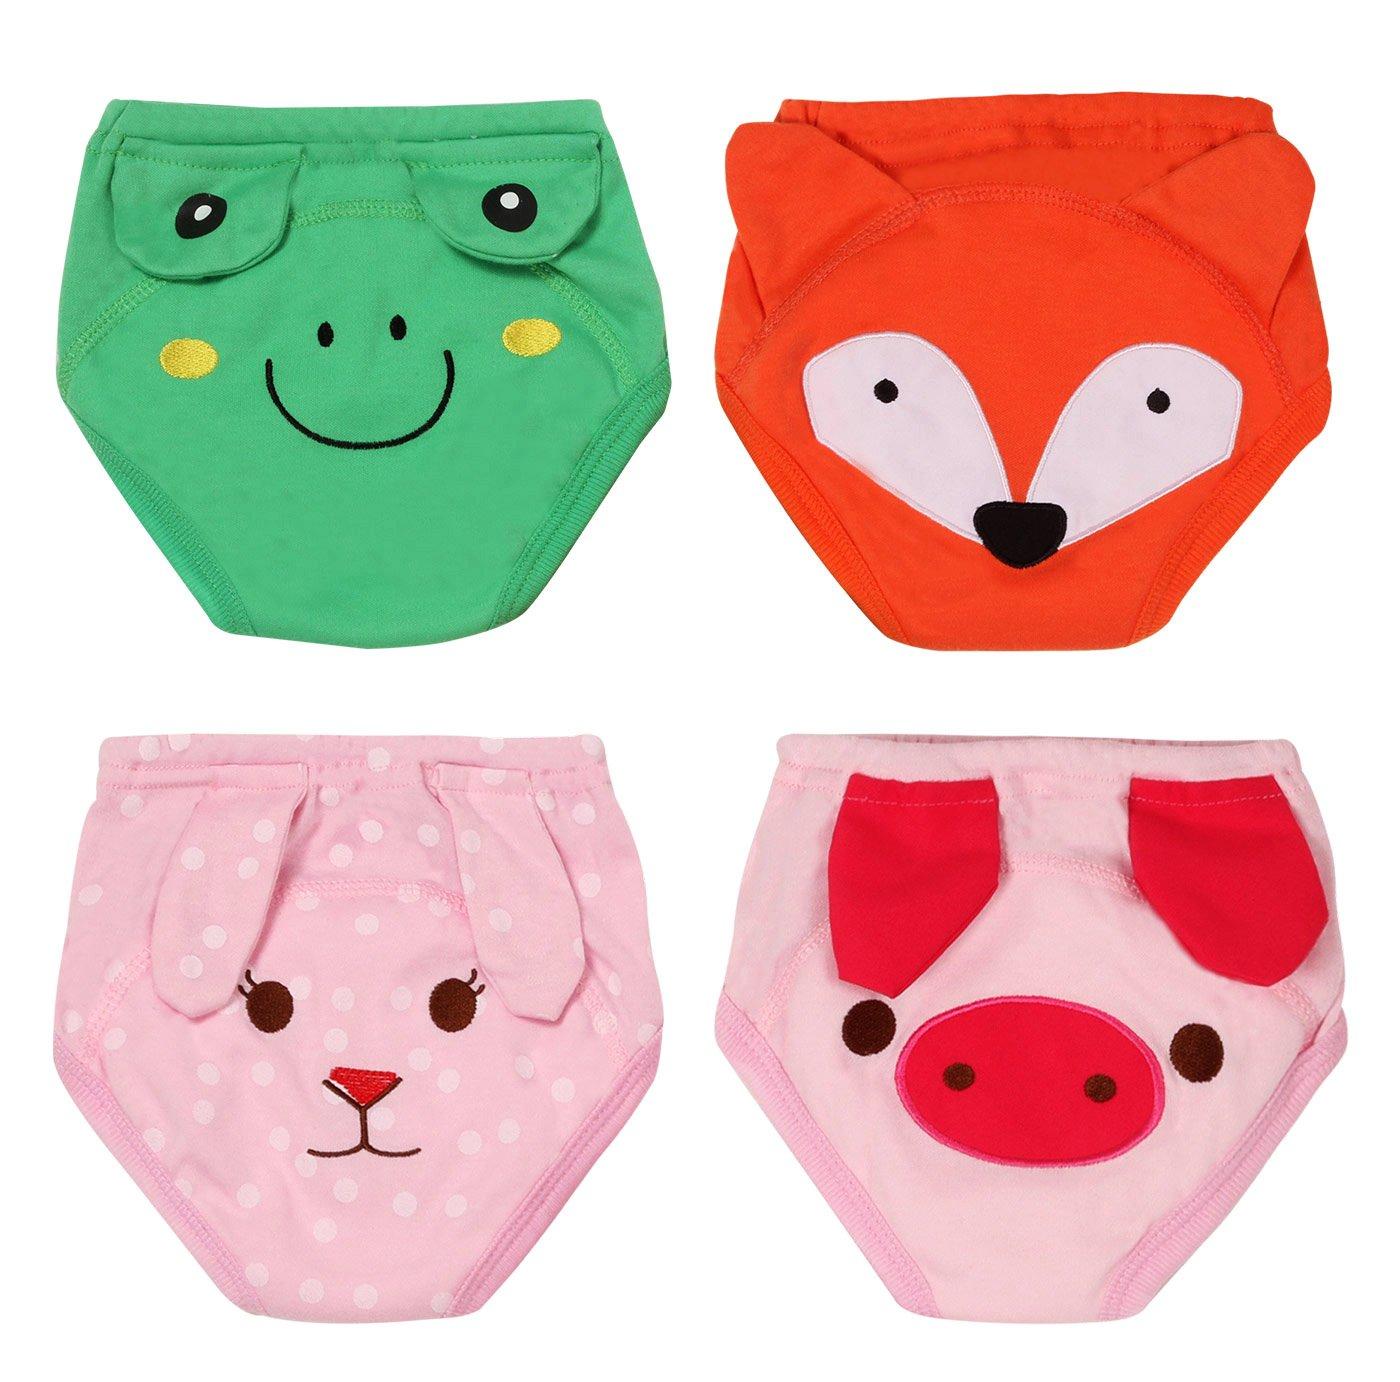 Toddler Training Underwear Pants 4 Layers Cotton Potty Training Waterproof TPU Pack of 4 Size 80 Rabbit Pig Frog Fox